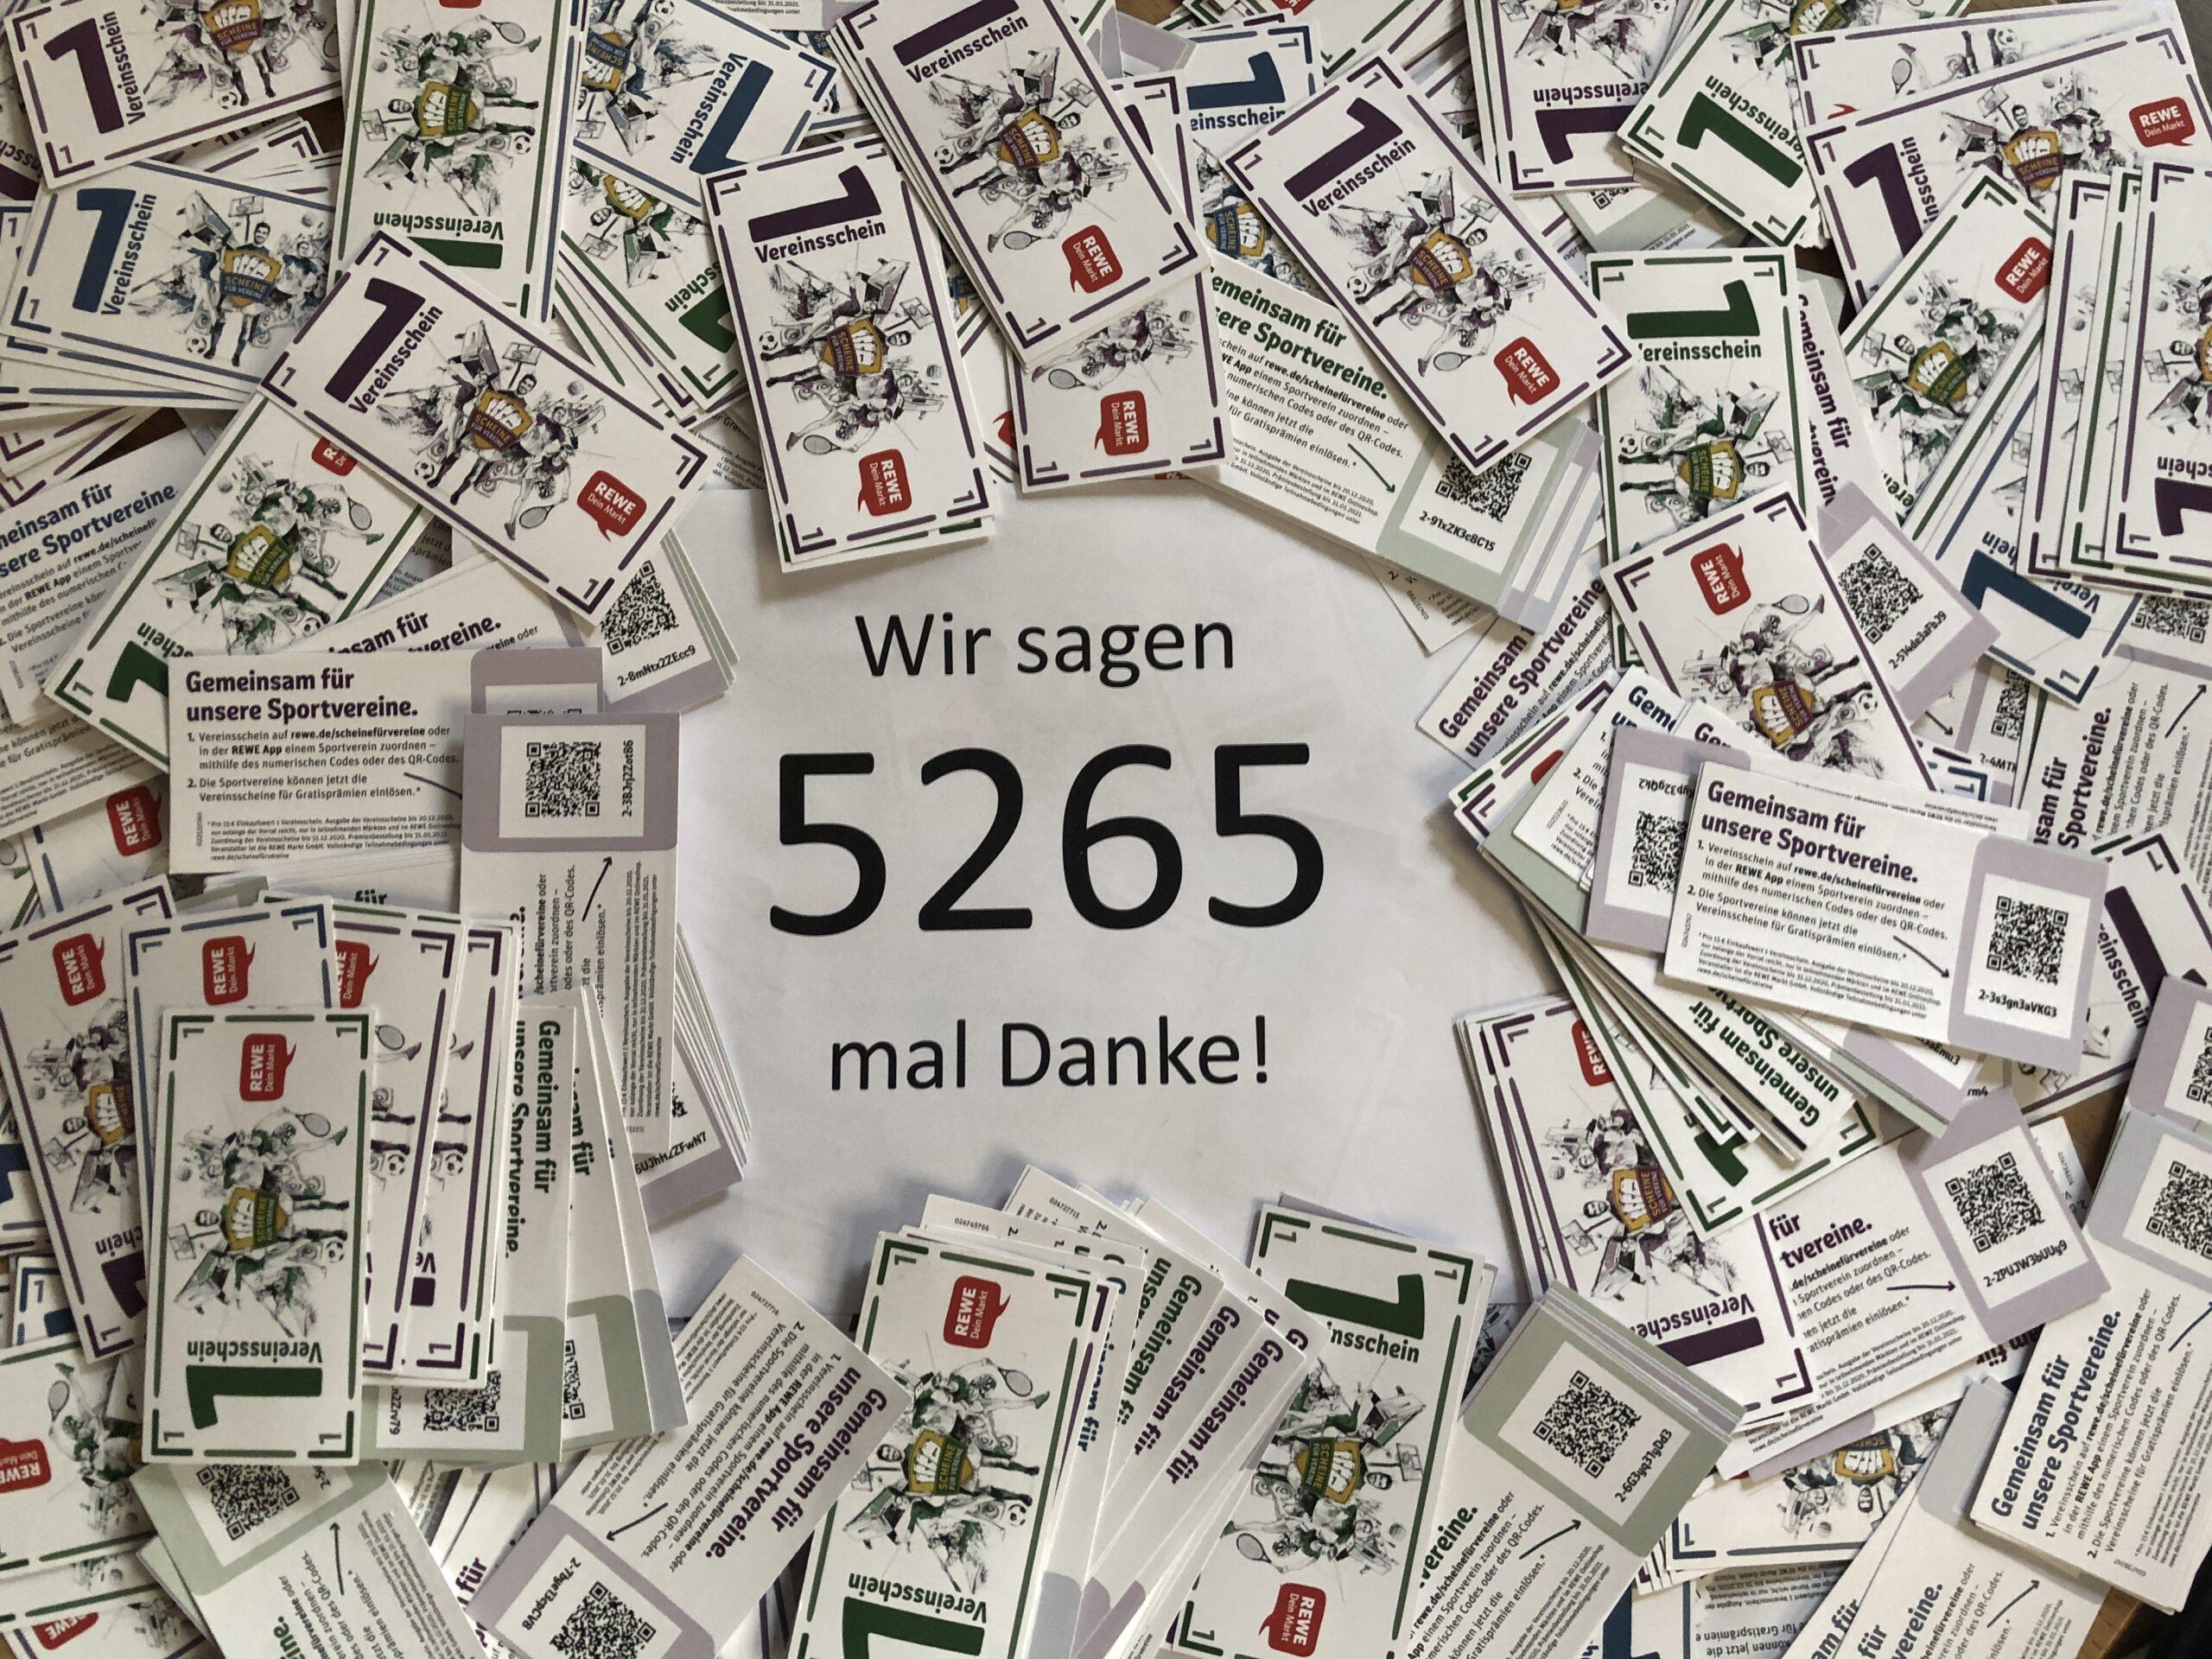 Wir sagen 5265 mal Danke